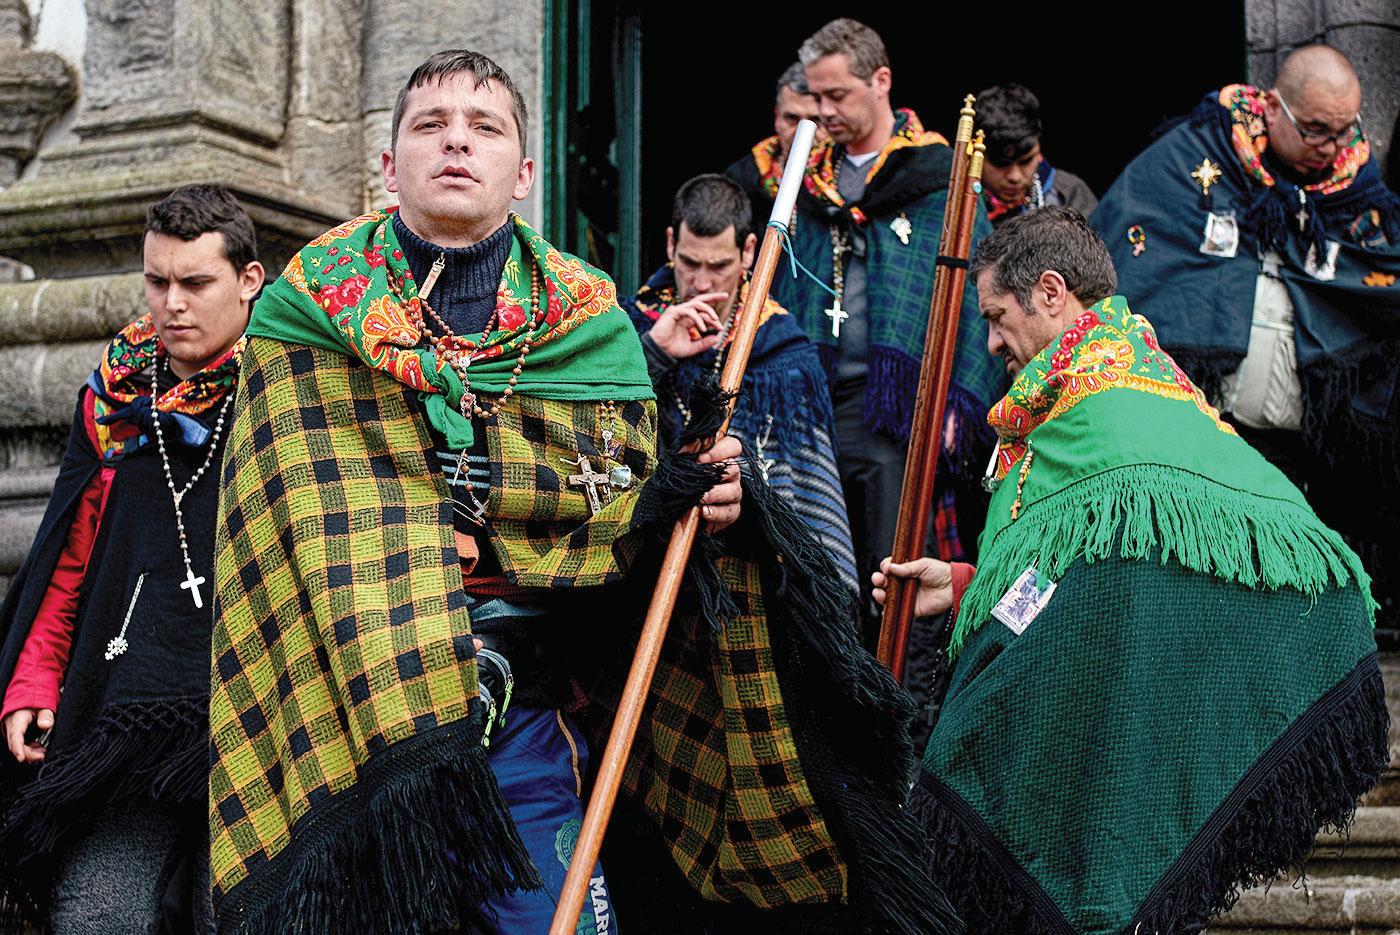 Photo of Romeiros do Canadá participam nas romarias dos Açores